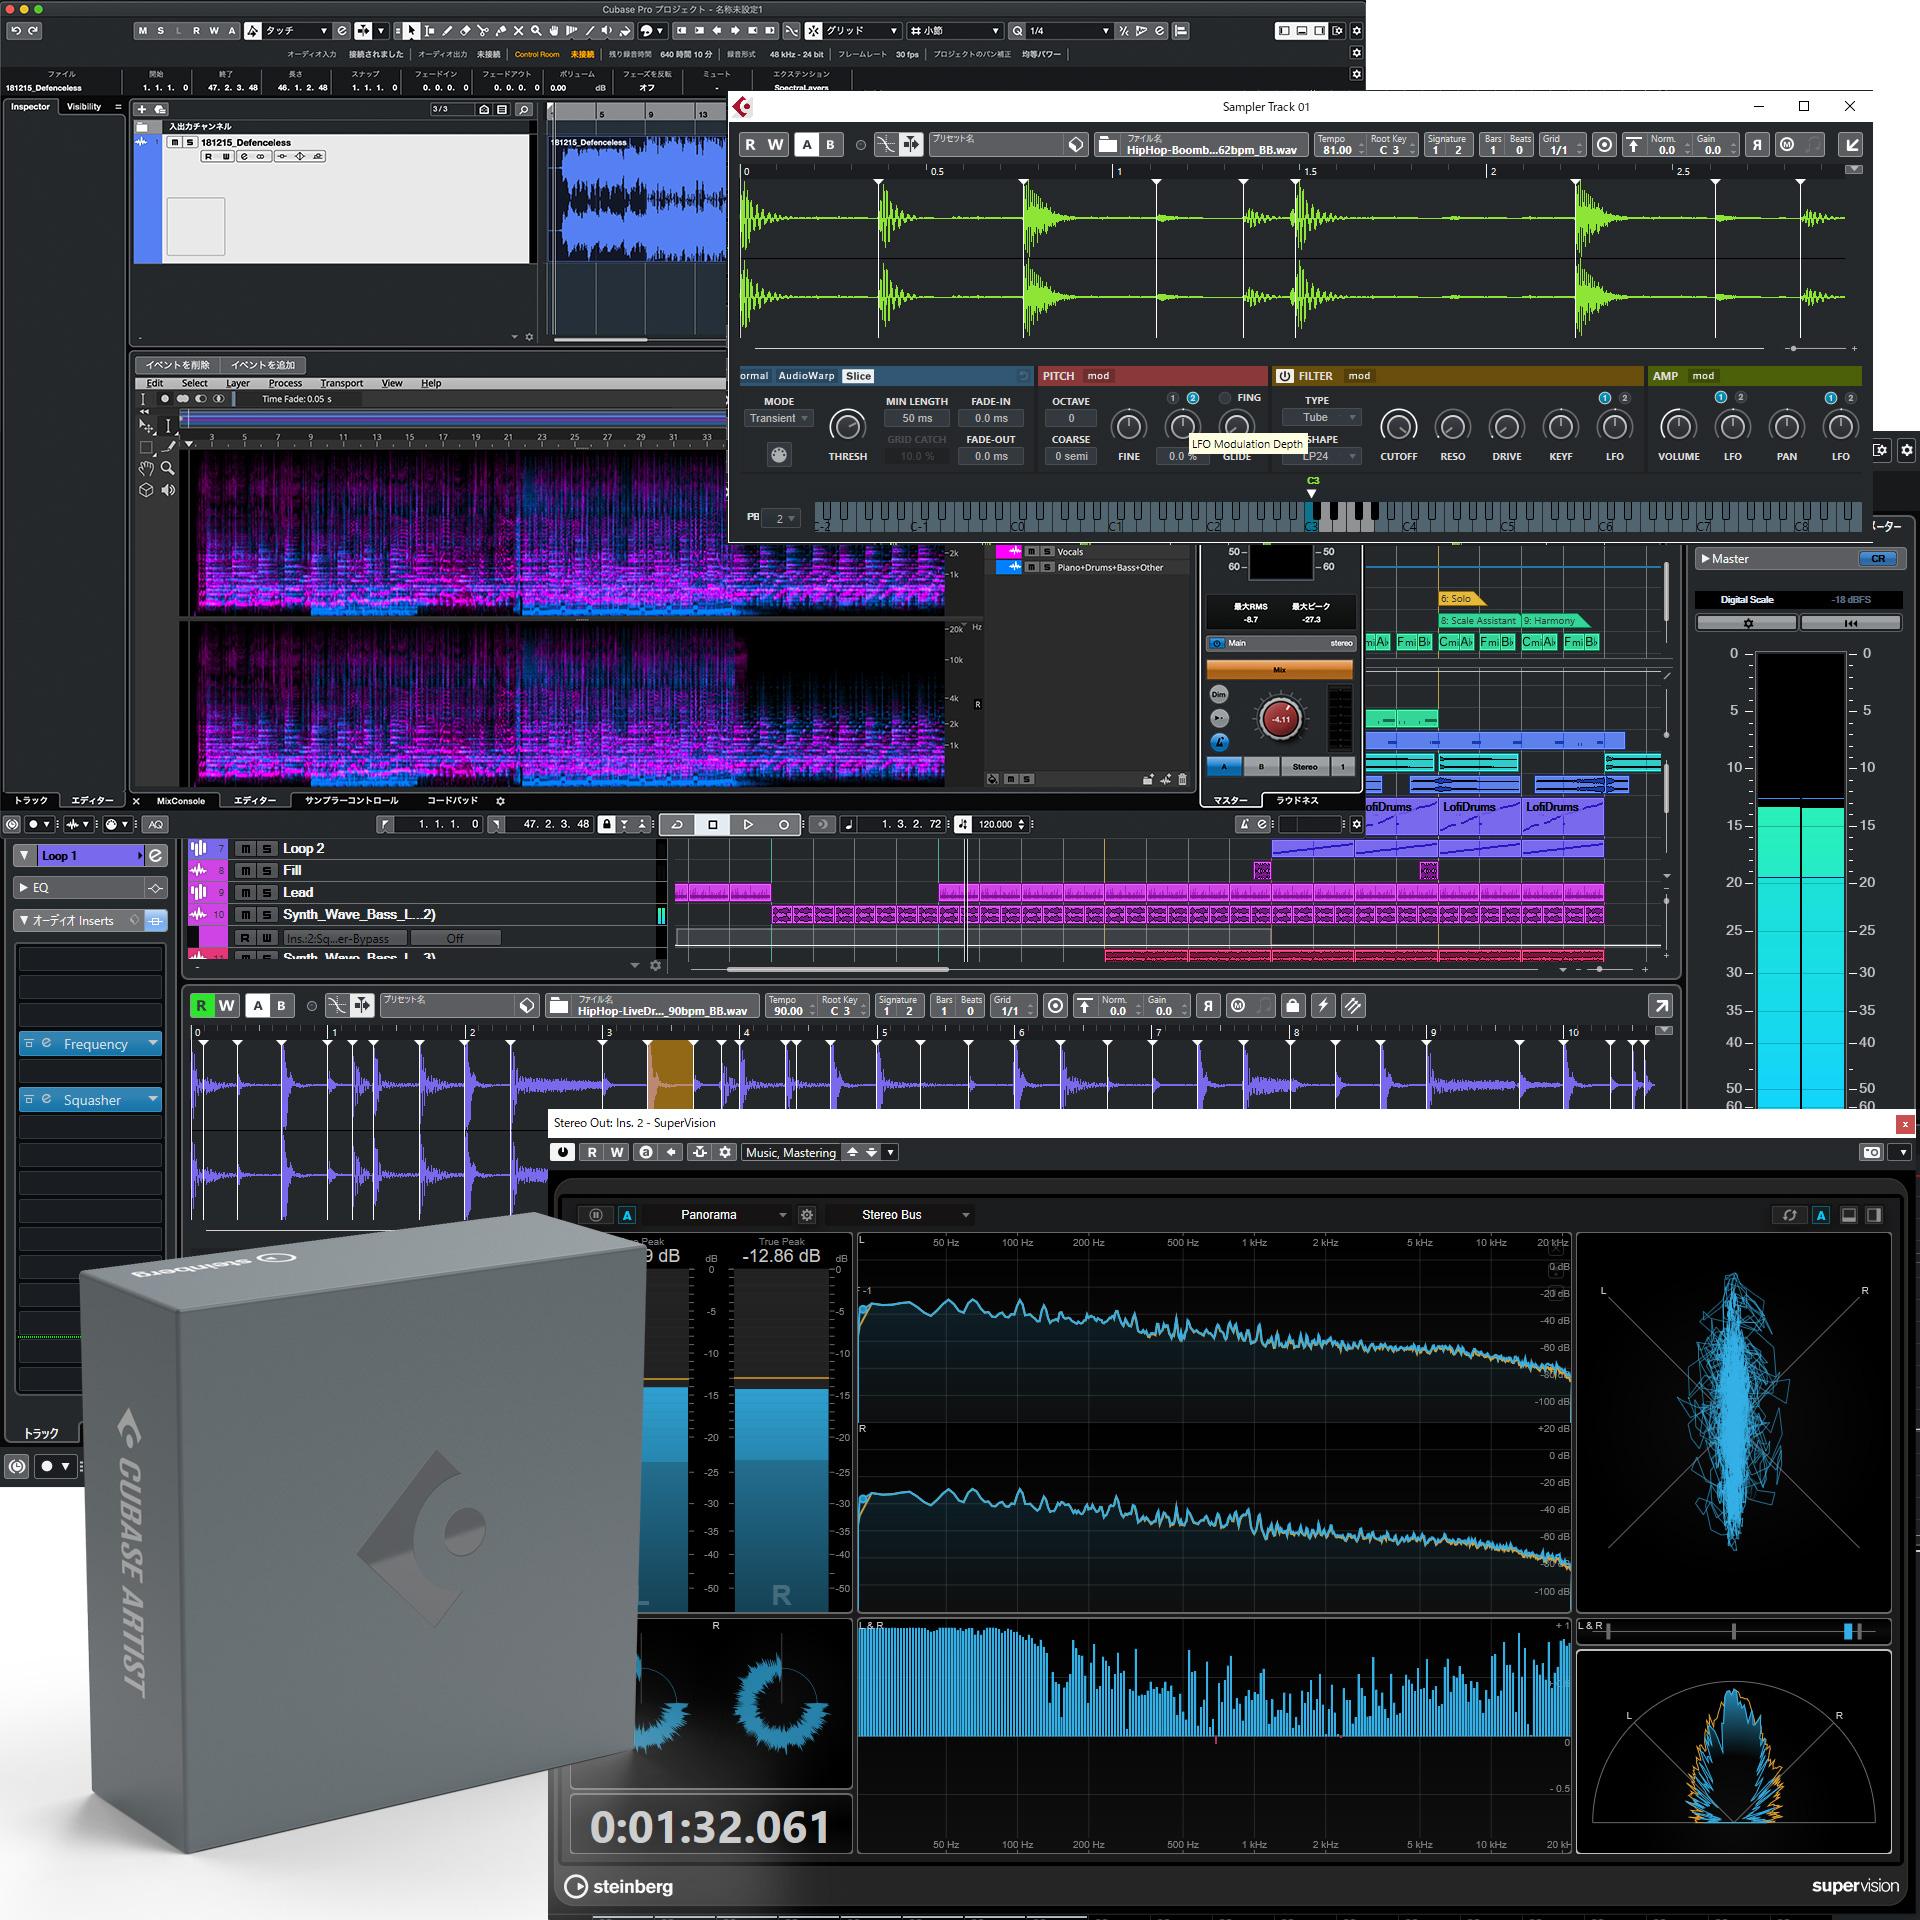 DTM DAWホストアプリケーションソフトウェア Steinberg Cubase Artist WEB限定 驚きの価格が実現 A.O.M.社プラグインプレゼントキャンペーン対象 USB-eLicenser付属 11